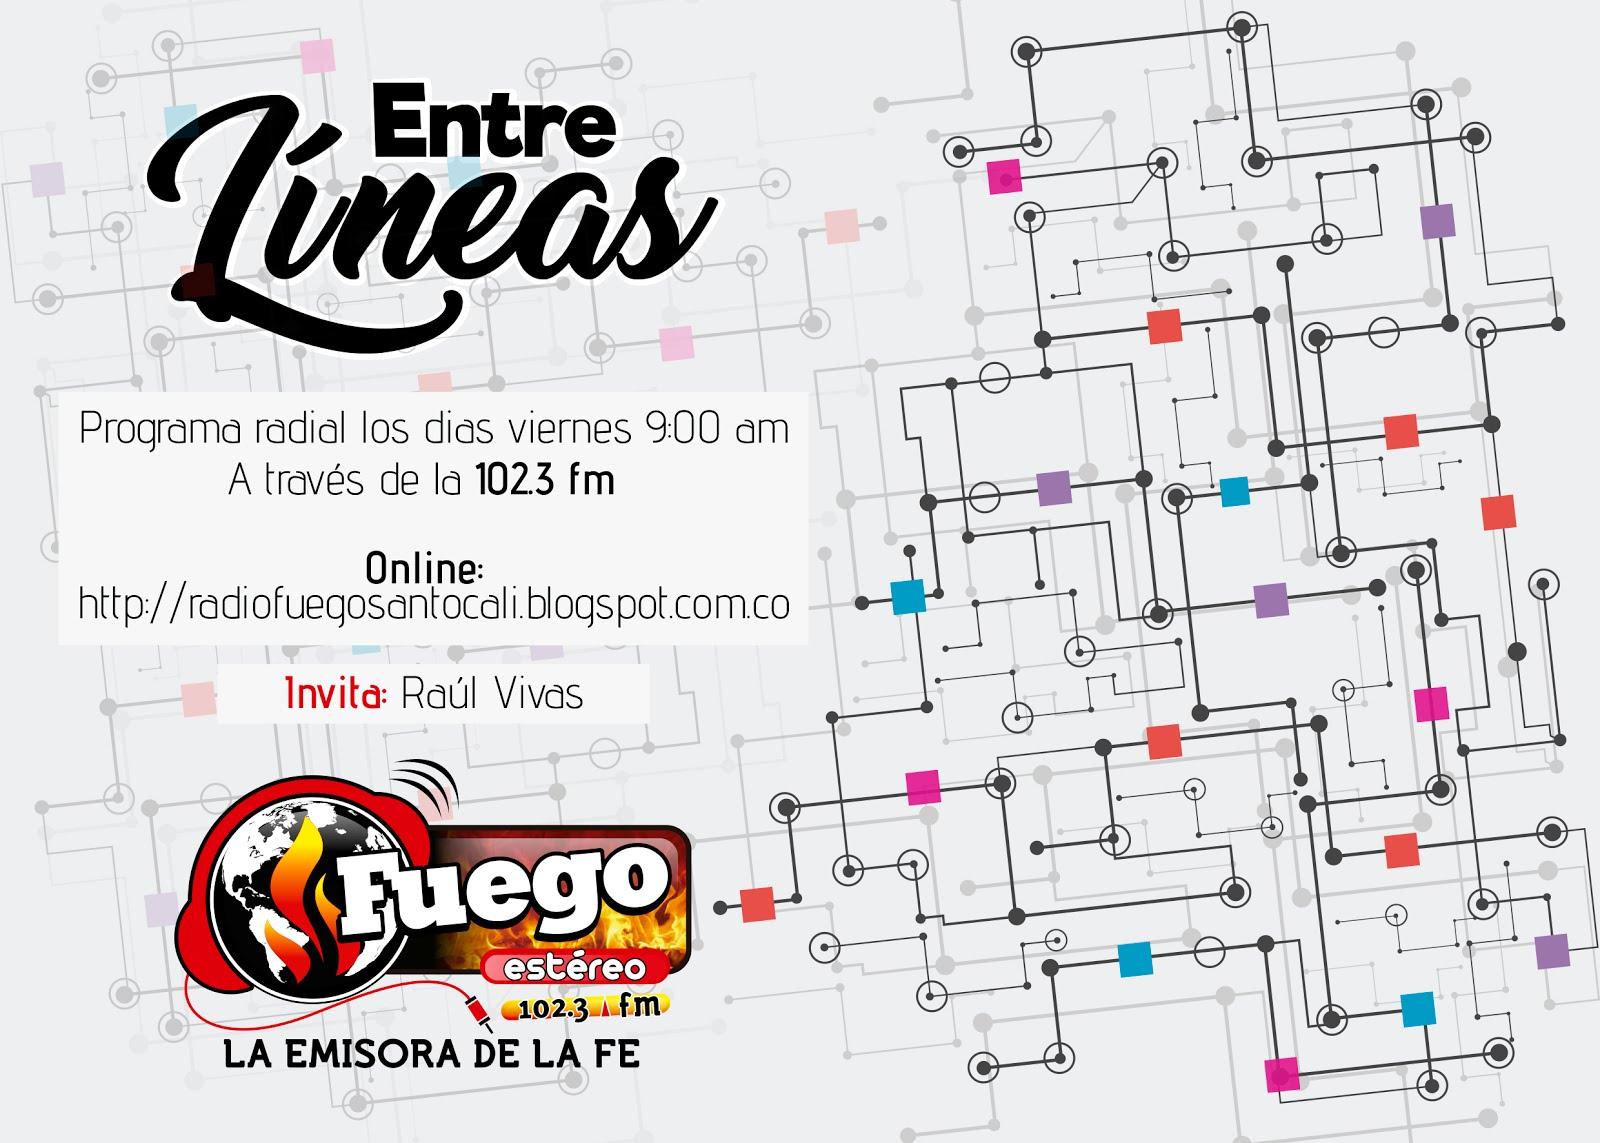 ENTRE LINEAS (PROGRAMA RADIAL)